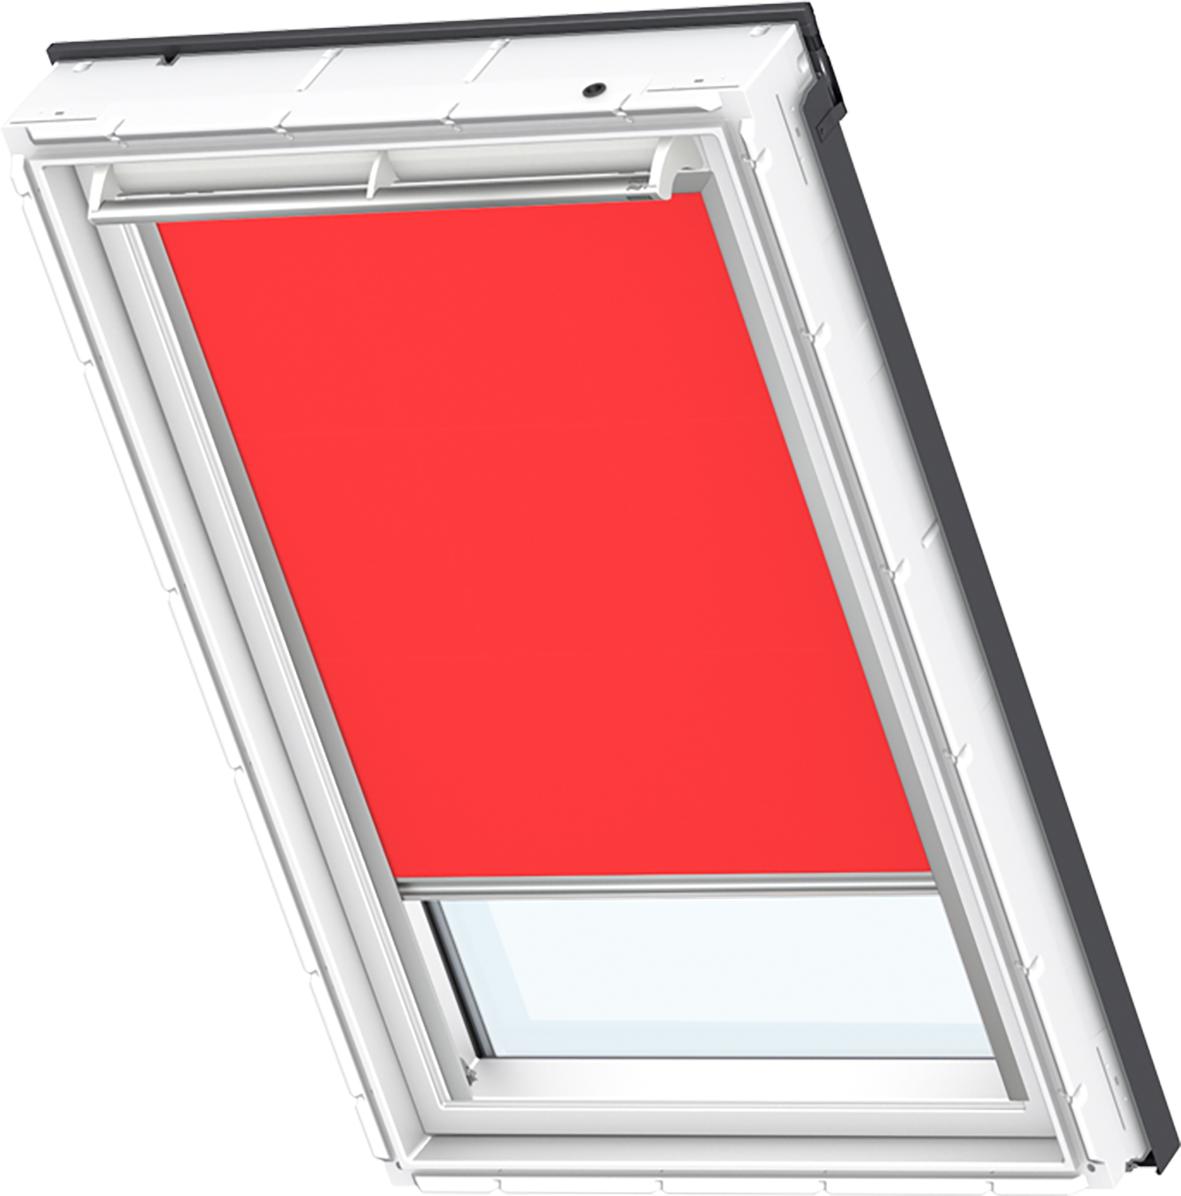 velux verdunkelungsrollo f r dachfenster vl vu vku fb 4570. Black Bedroom Furniture Sets. Home Design Ideas